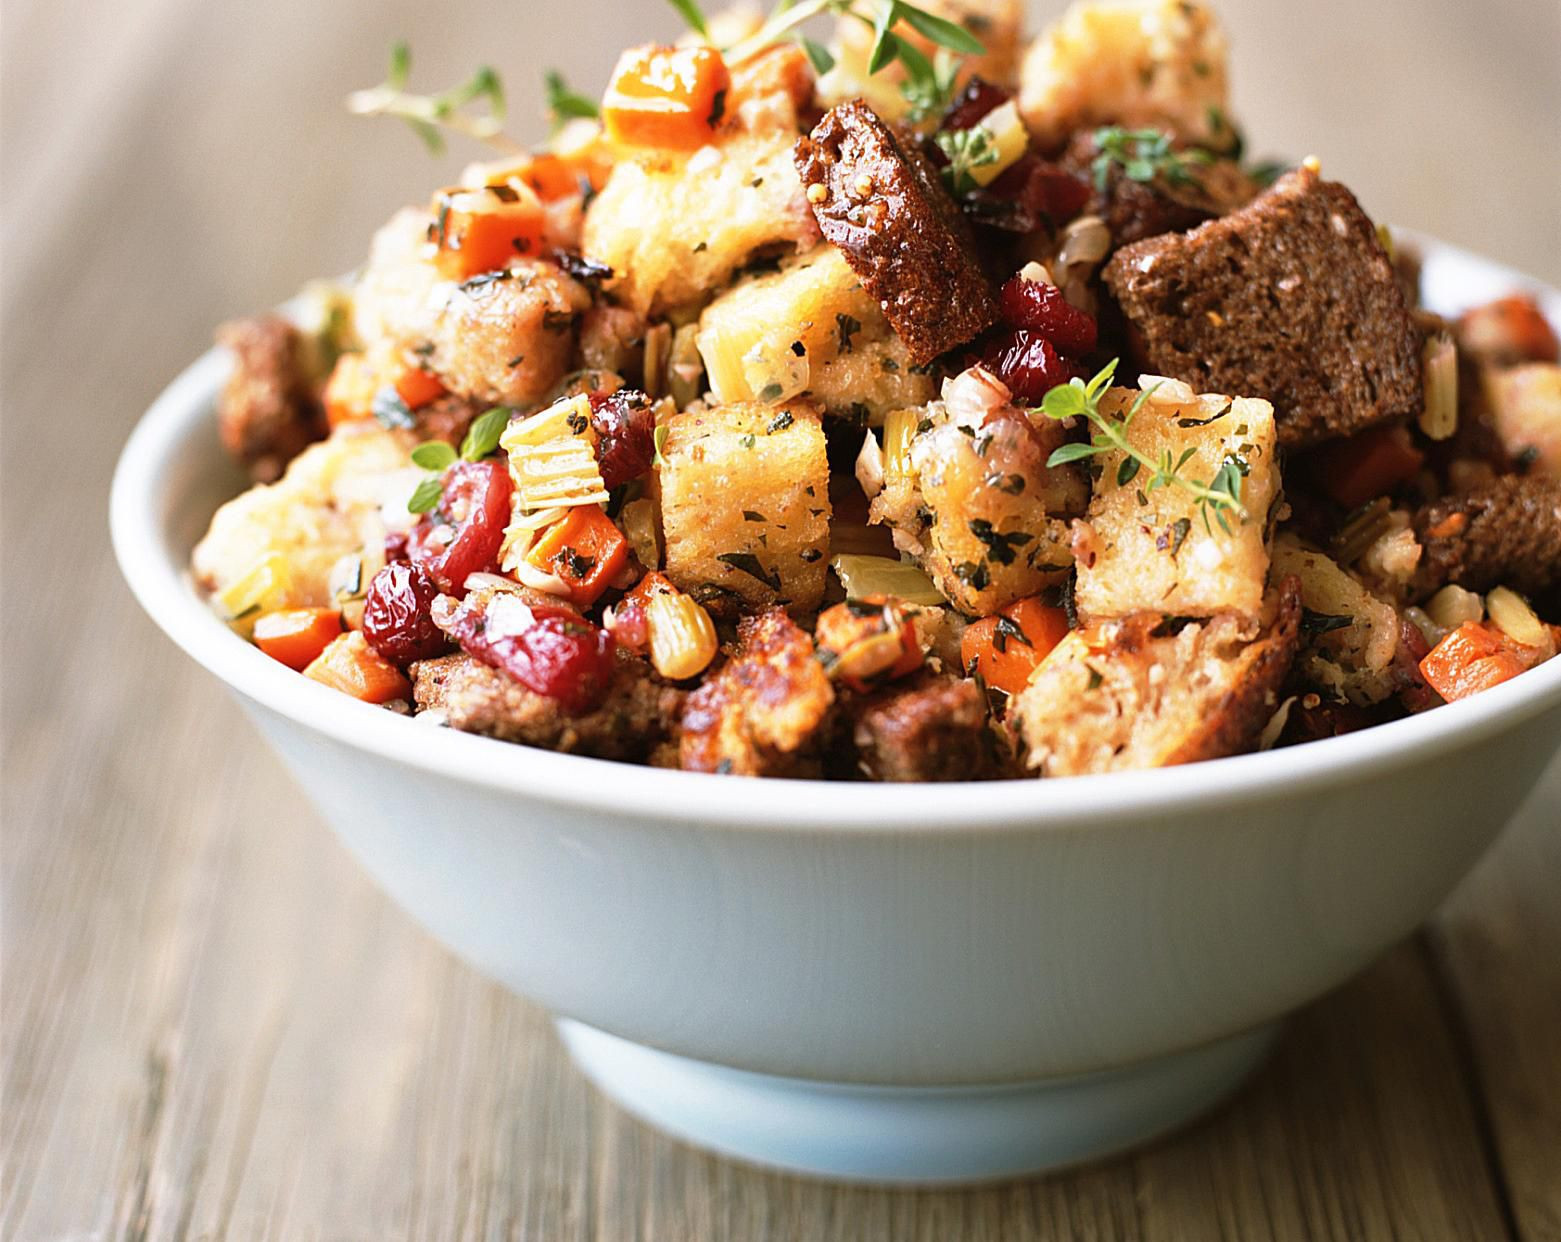 Vegan Thanksgiving Menu Ideas  Ve arian and Vegan Thanksgiving Menu Ideas and Recipes